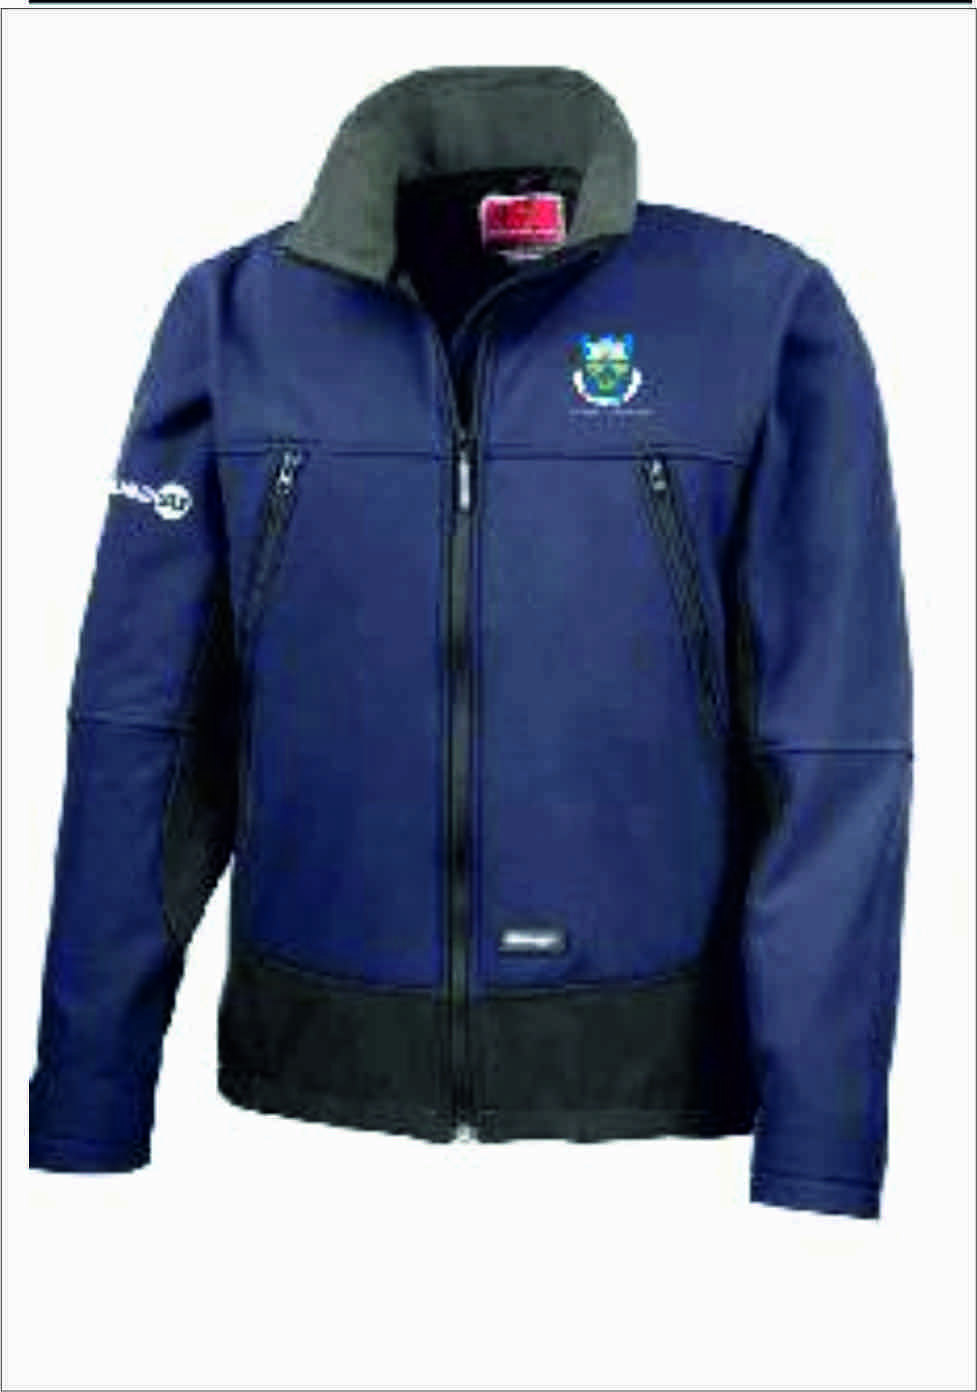 Uea - Hockey Soft Shell Jacket